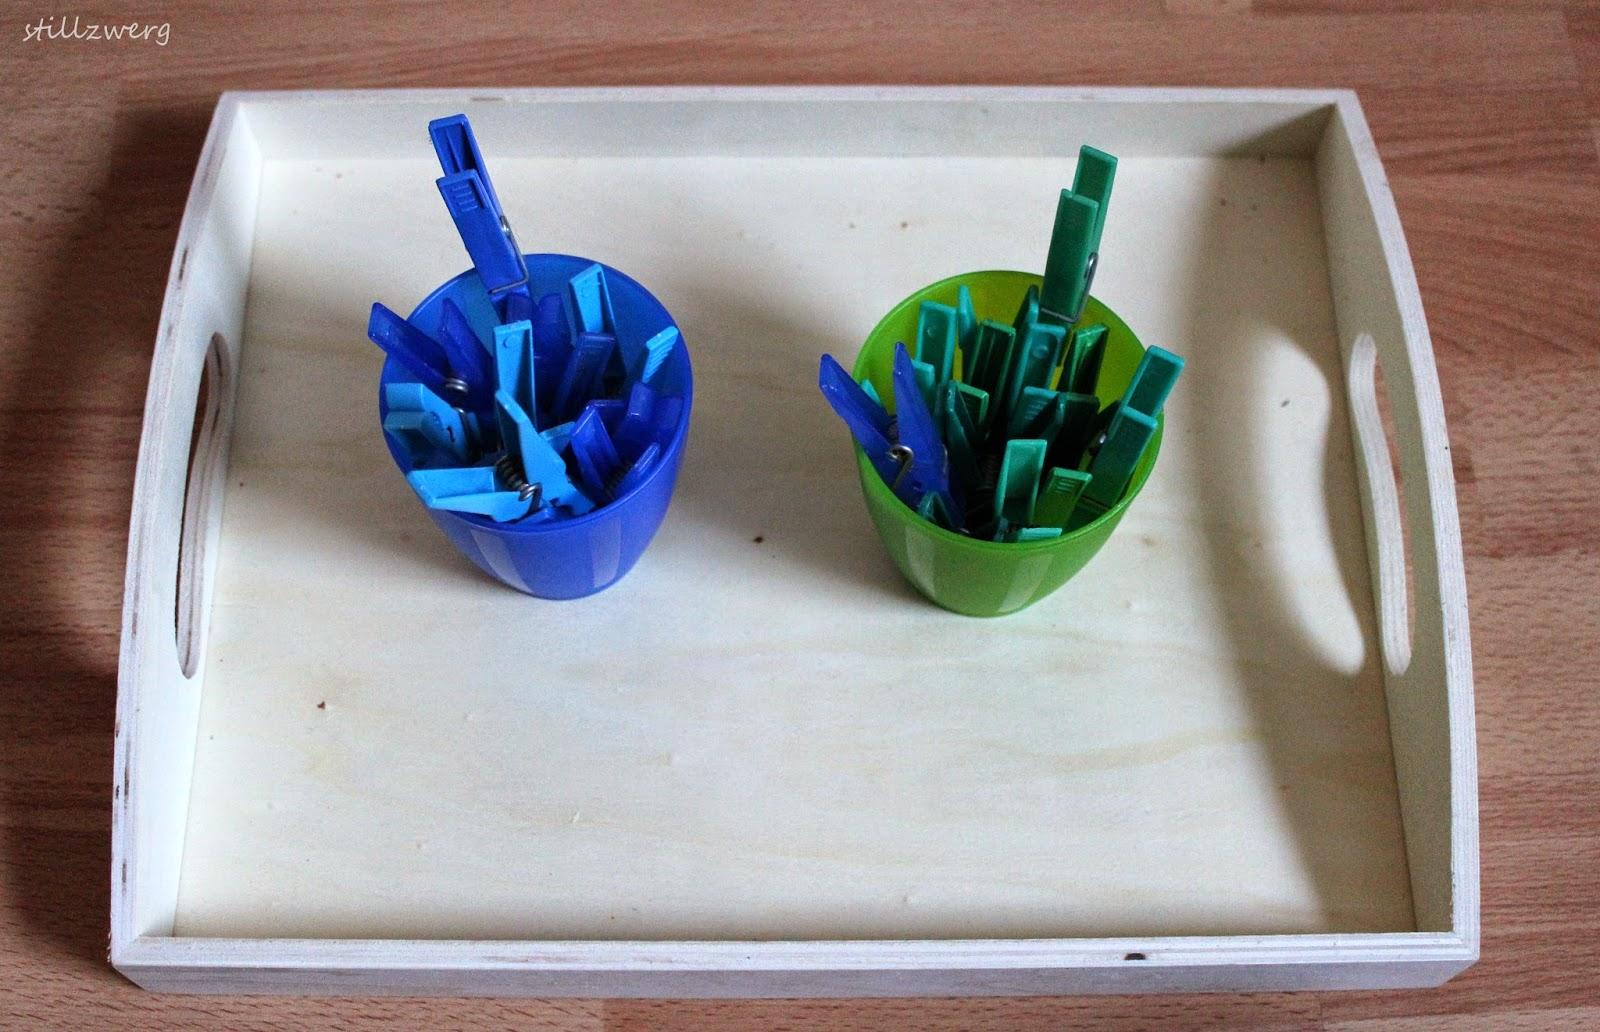 der stillzwerg sortier bung nach farbe blau hellblau gr n t rkis. Black Bedroom Furniture Sets. Home Design Ideas